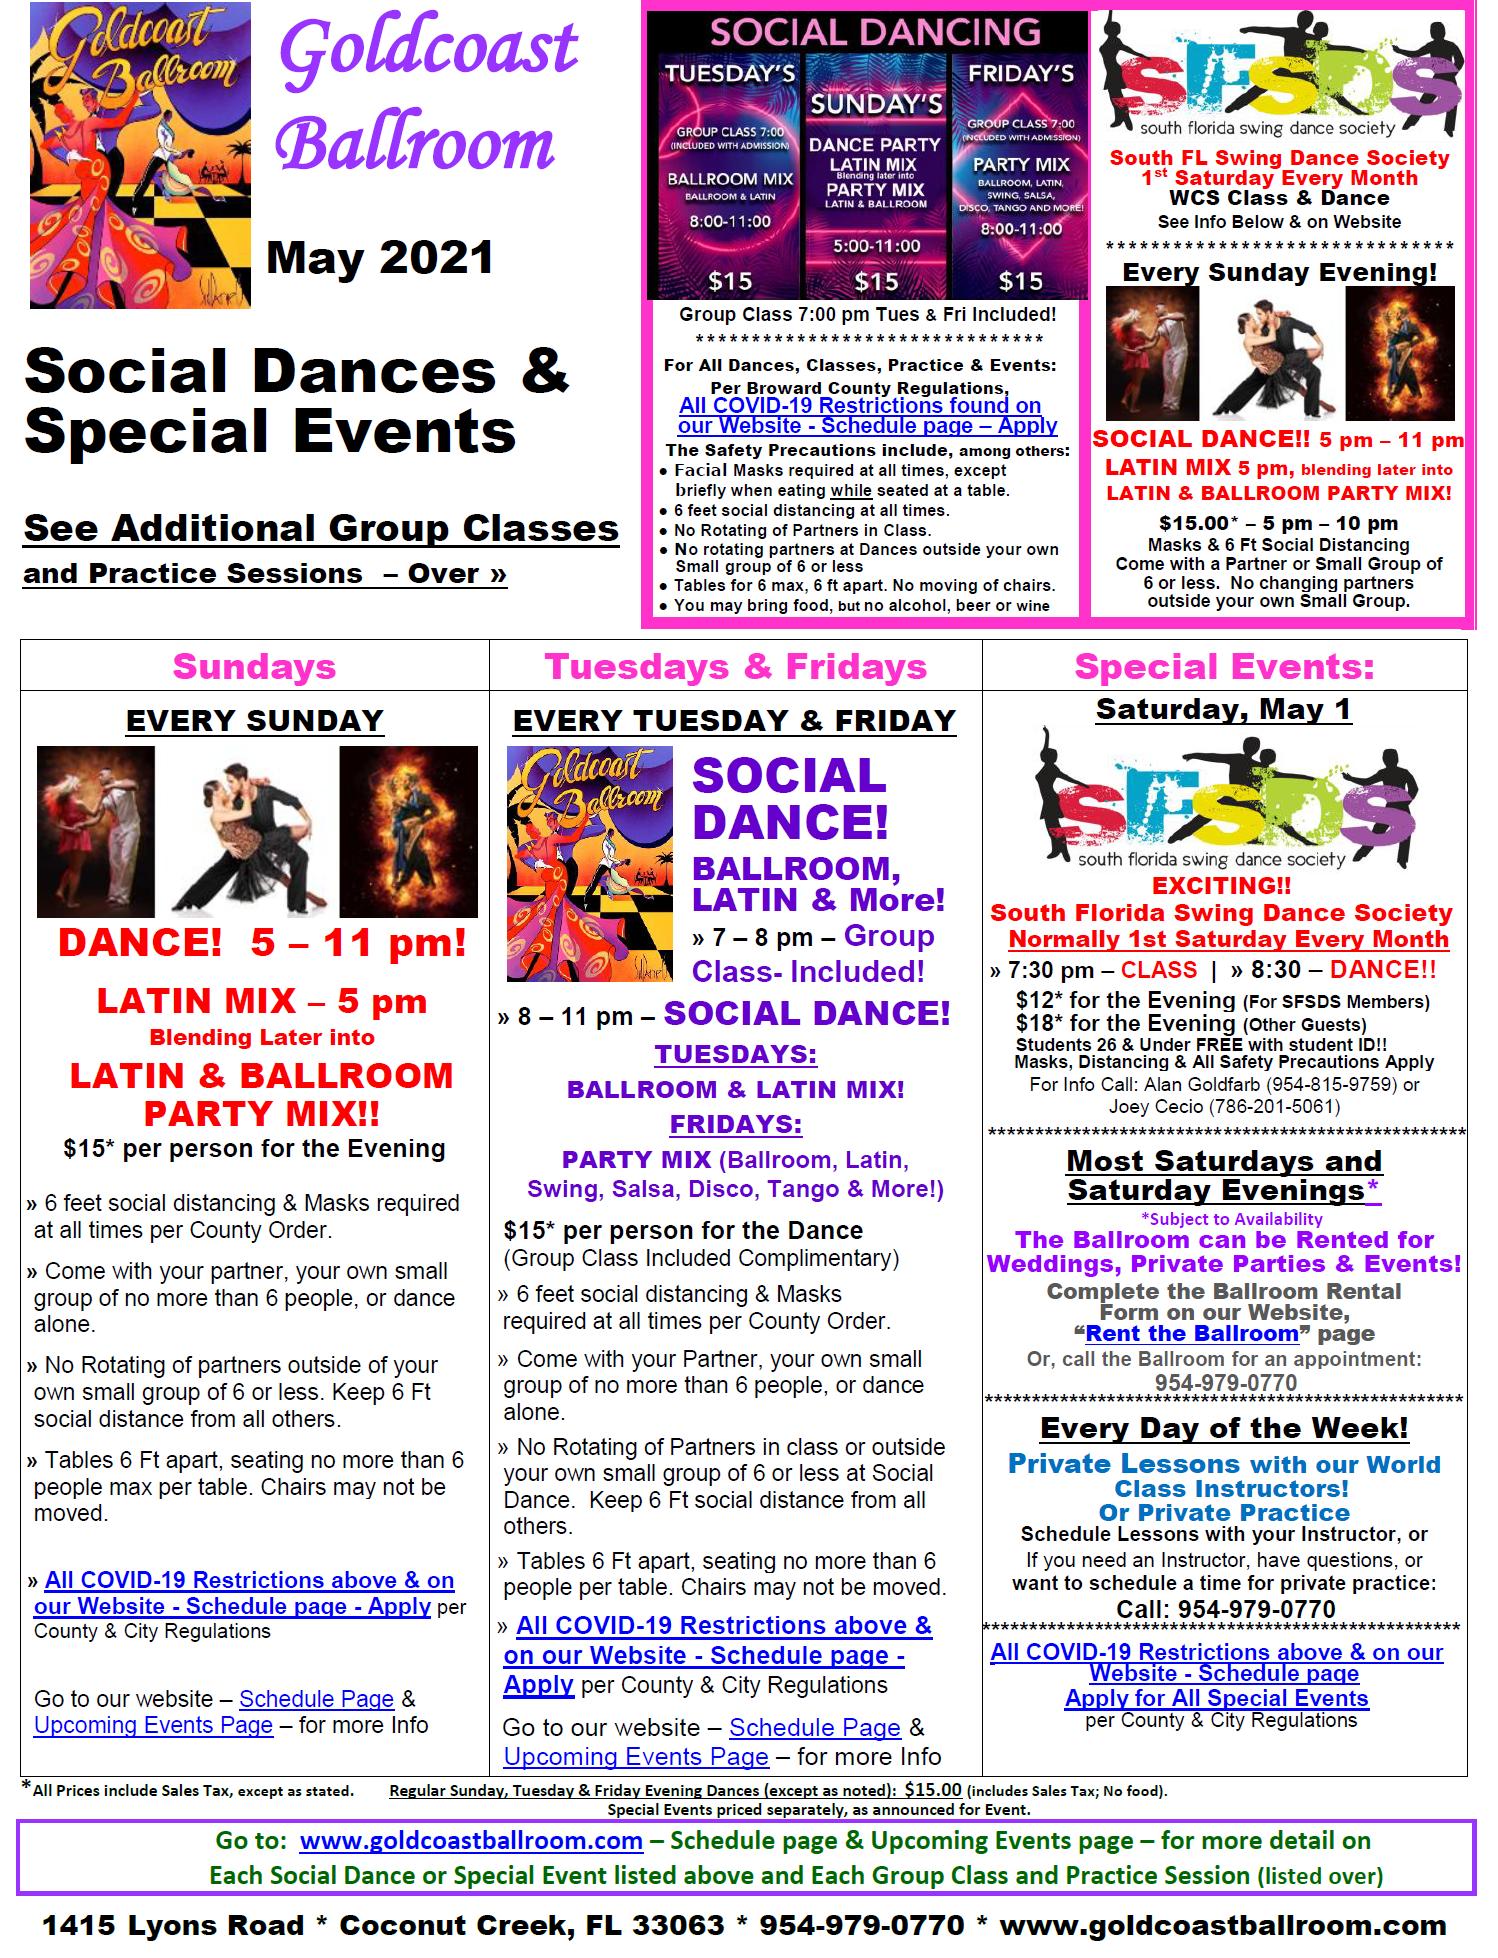 Goldcoast Ballroom May 2021 Calendar - Social Dances & Special Events